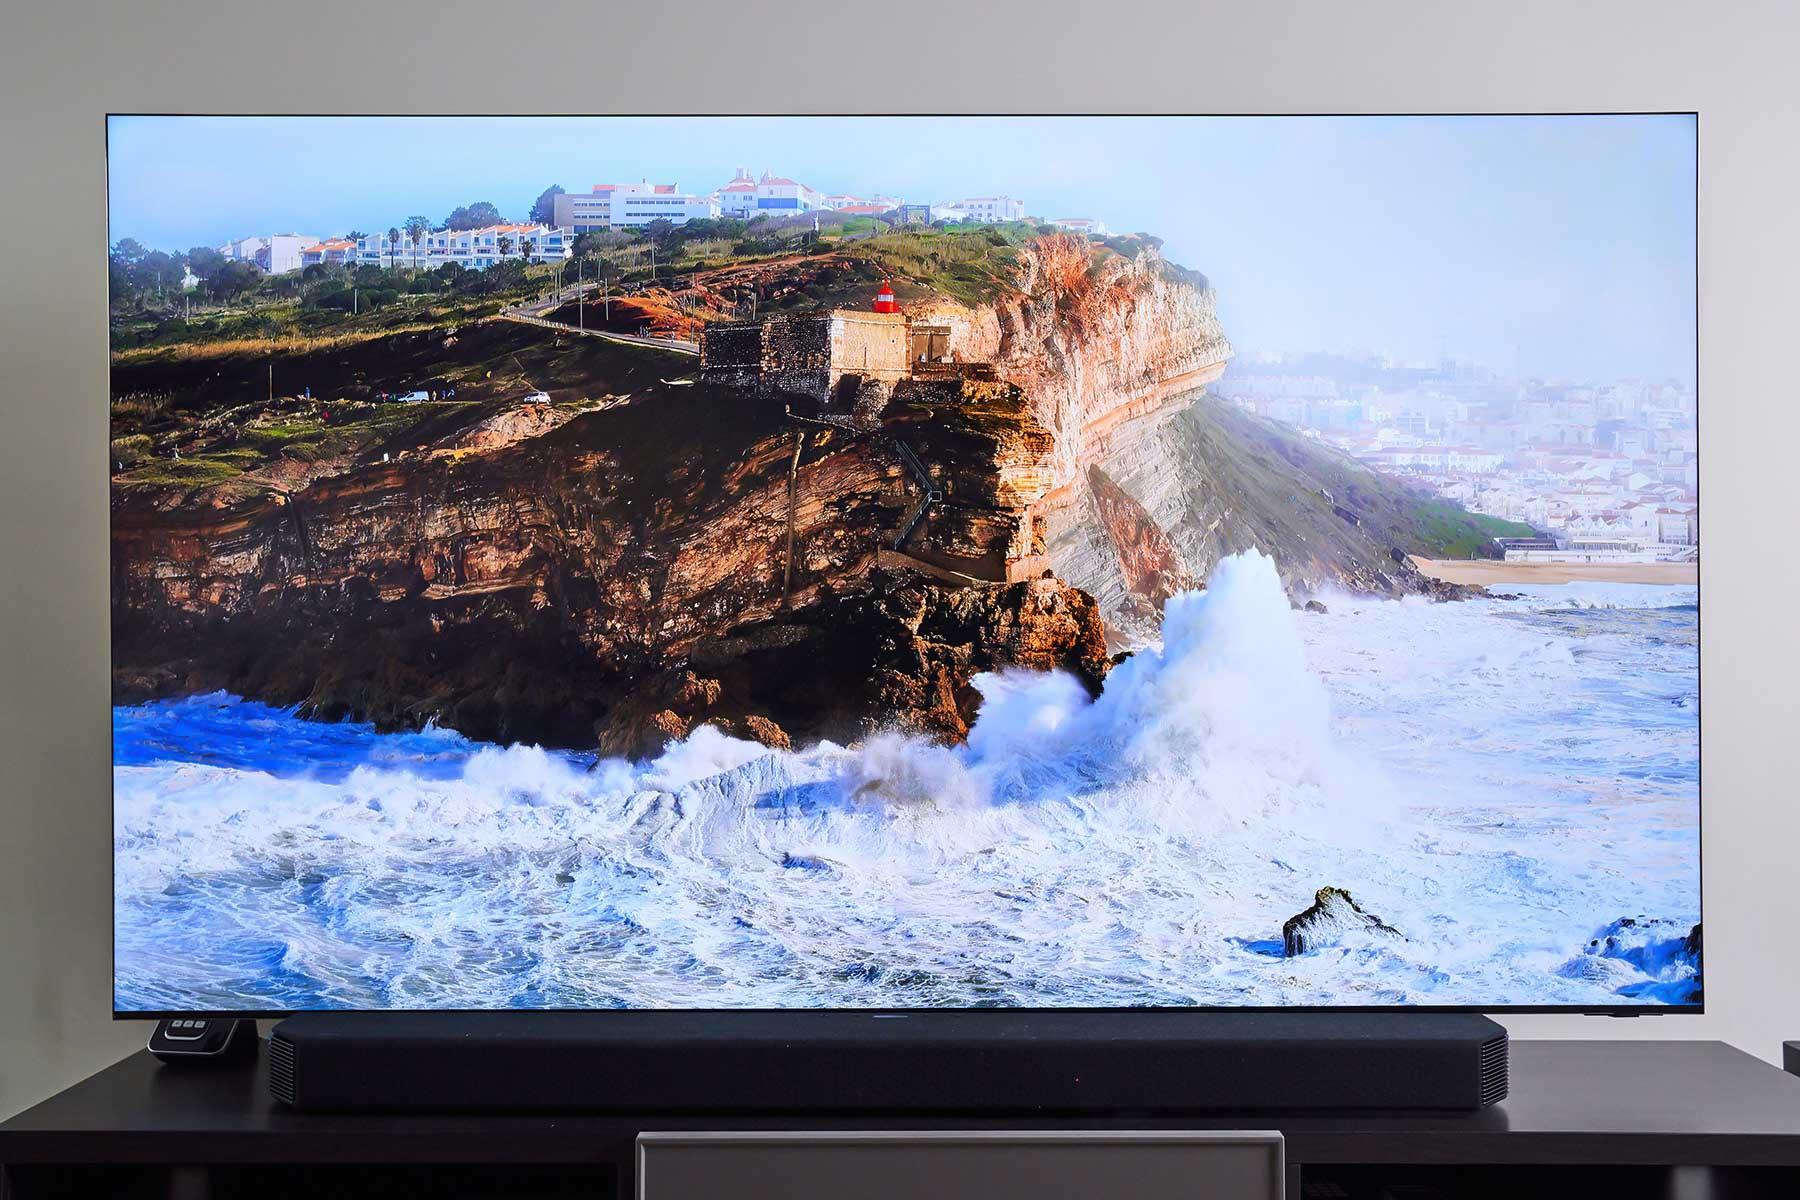 12bit 的色彩規格是 Neo QLED 8K 量子電視得以展現更大的動態範圍,以及更微小的明暗變化與細節的關鍵,而金屬量子顯色技術則讓色彩更加鮮豔、真實。